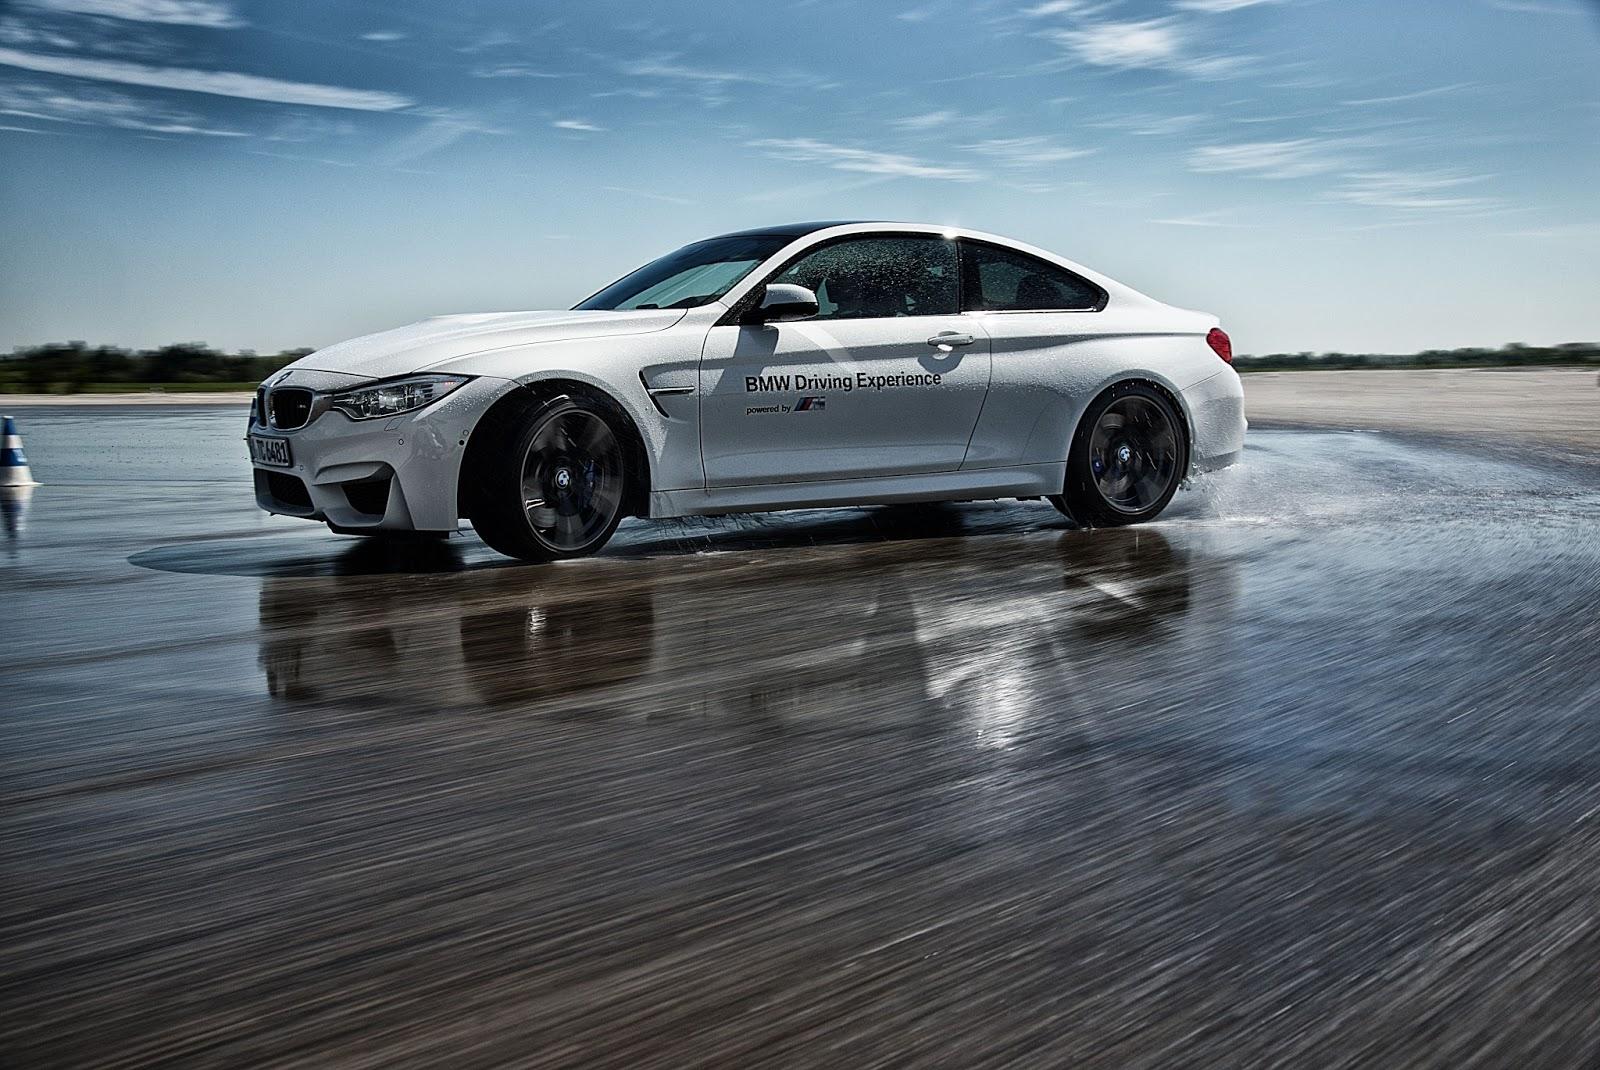 P90254181 highRes bmw mini driving ex 1 Γίνε καλύτερος οδηγός κάτω από όλες τις συνθήκες, με Bmw και Mini BMW, BMW i, BMW M, Driver, Driving Skills, Safety, οδήγηση, οδηγοί